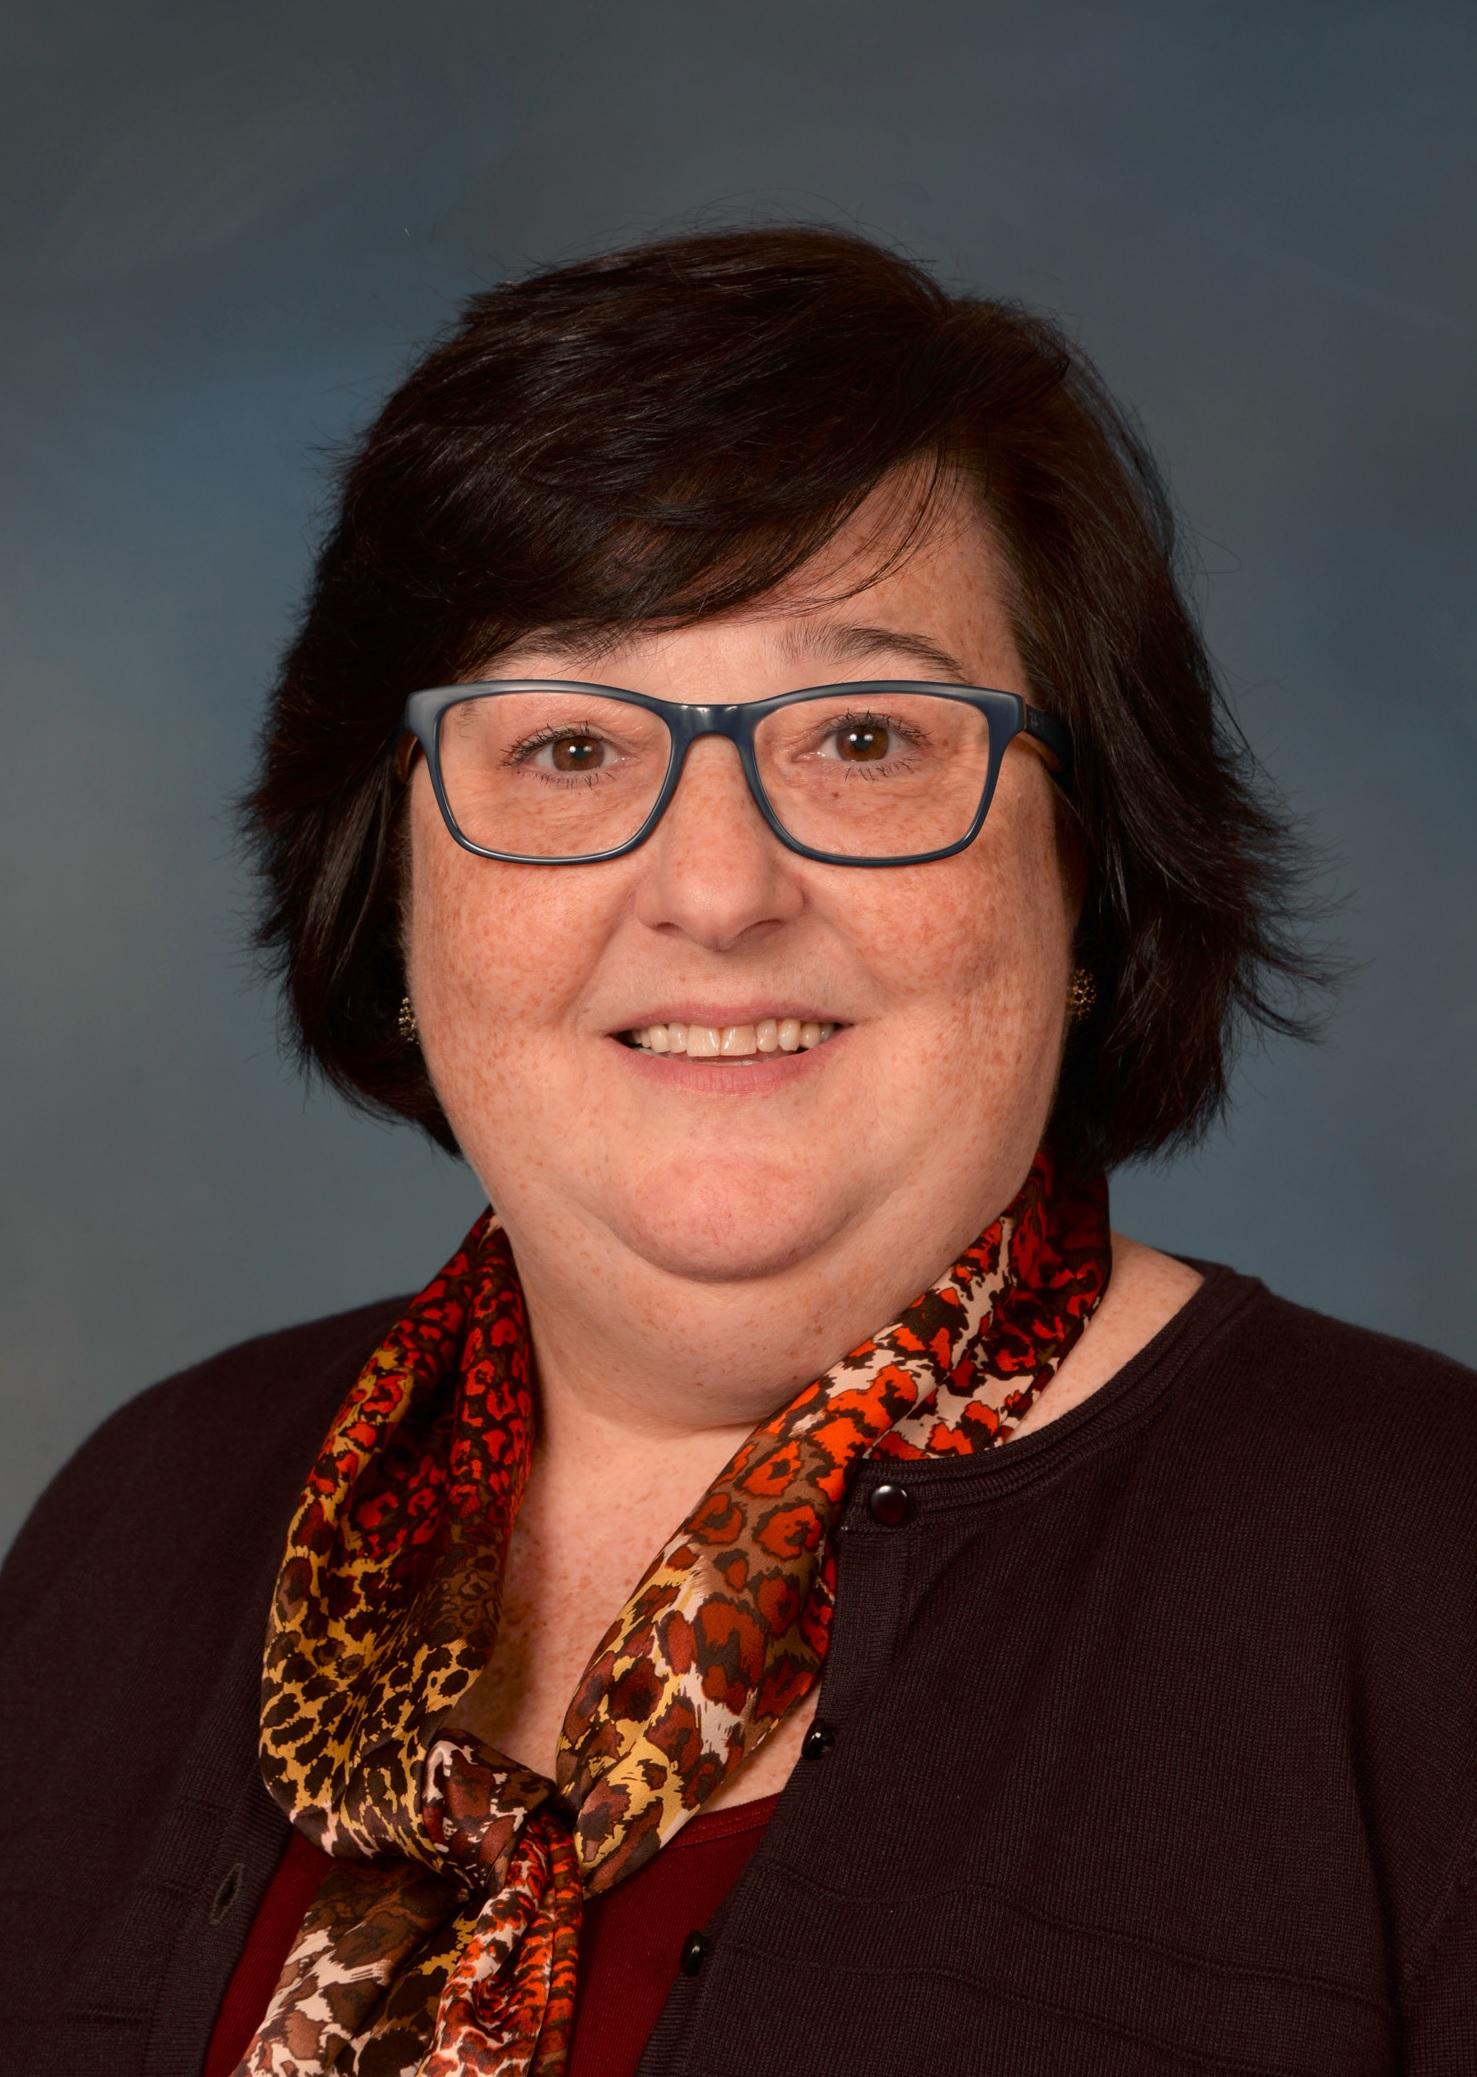 Prof. Ana Moraña, Modern Languages Dept., Shippensburg University.